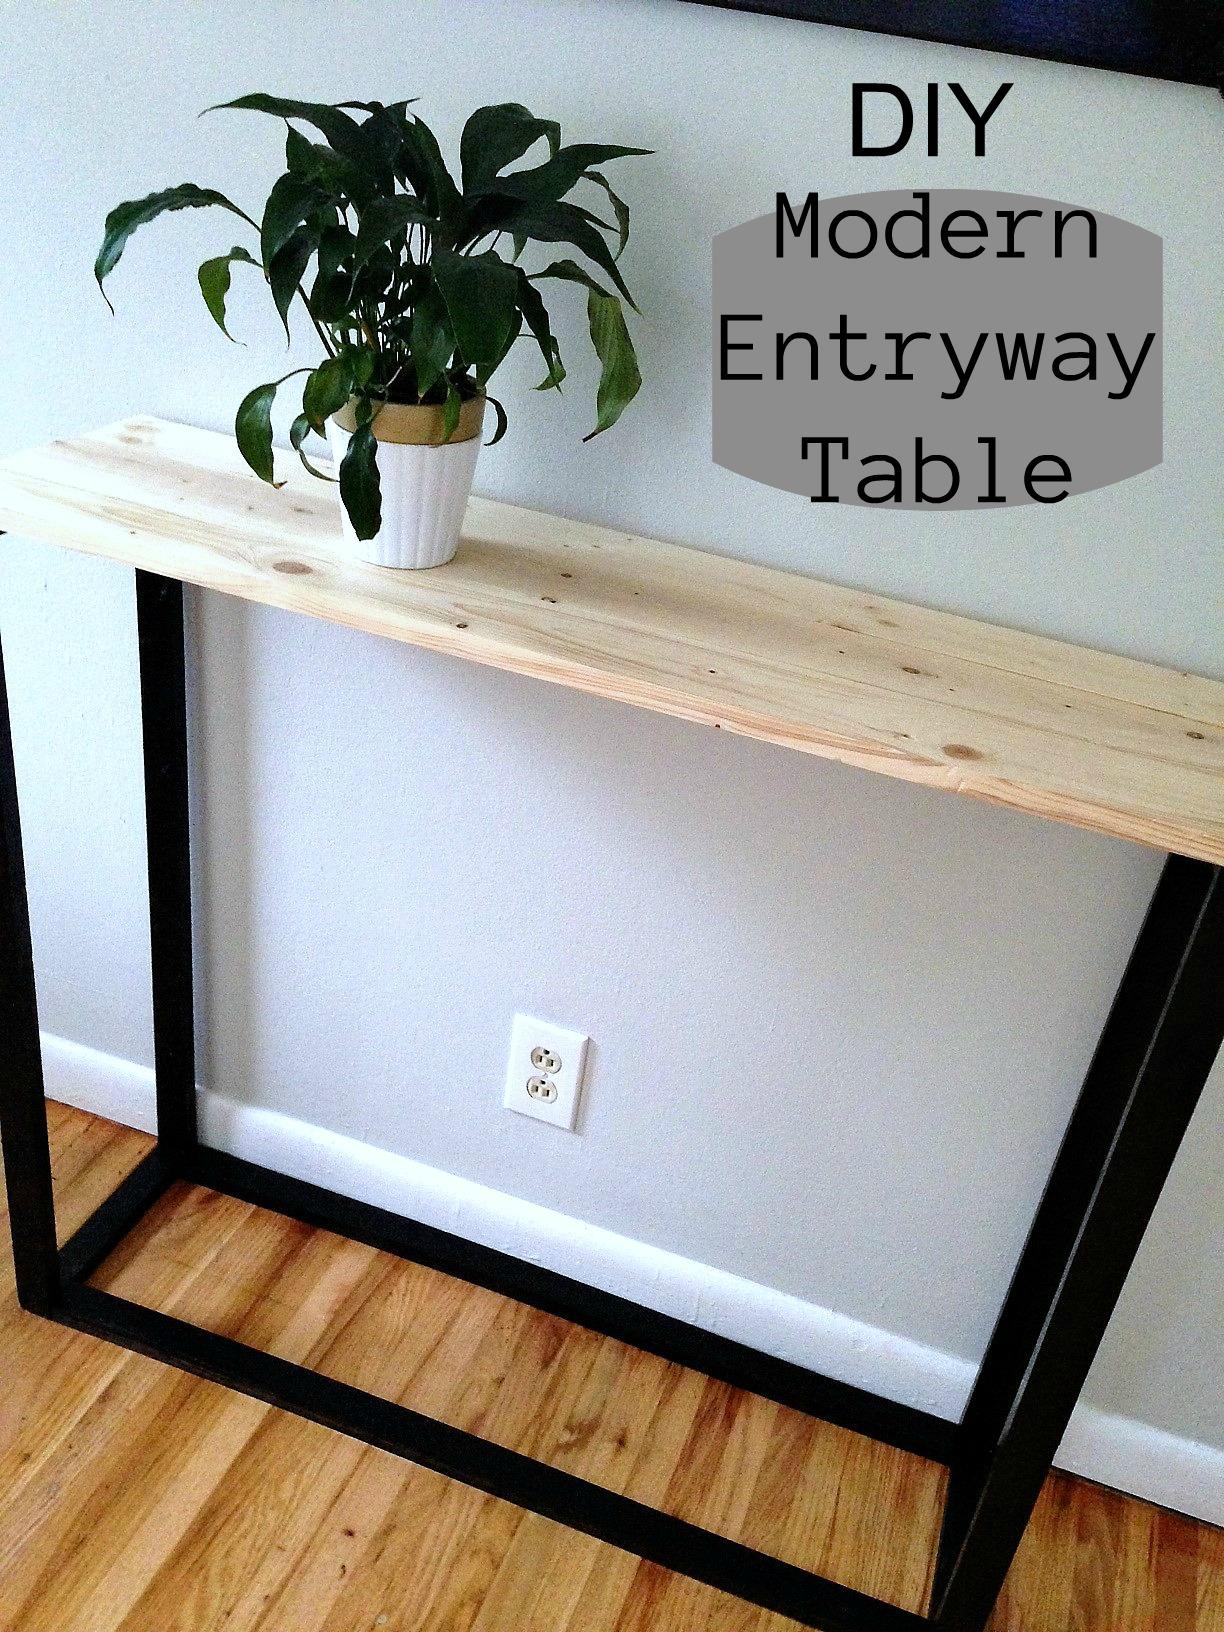 diy modern entryway table